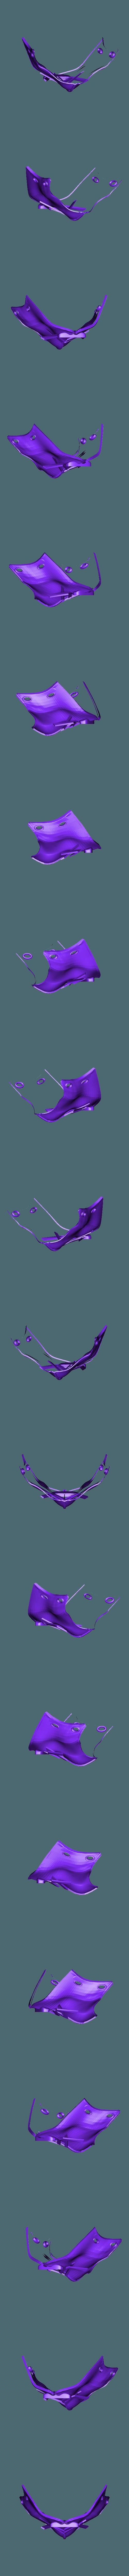 model alan walker barra especial STL.stl Download free 3DS file Alan Walker Coronavirus protection mask (COVID-19) MOD 1 #3DvsCOVID19 • 3D printer object, ronaldocc13